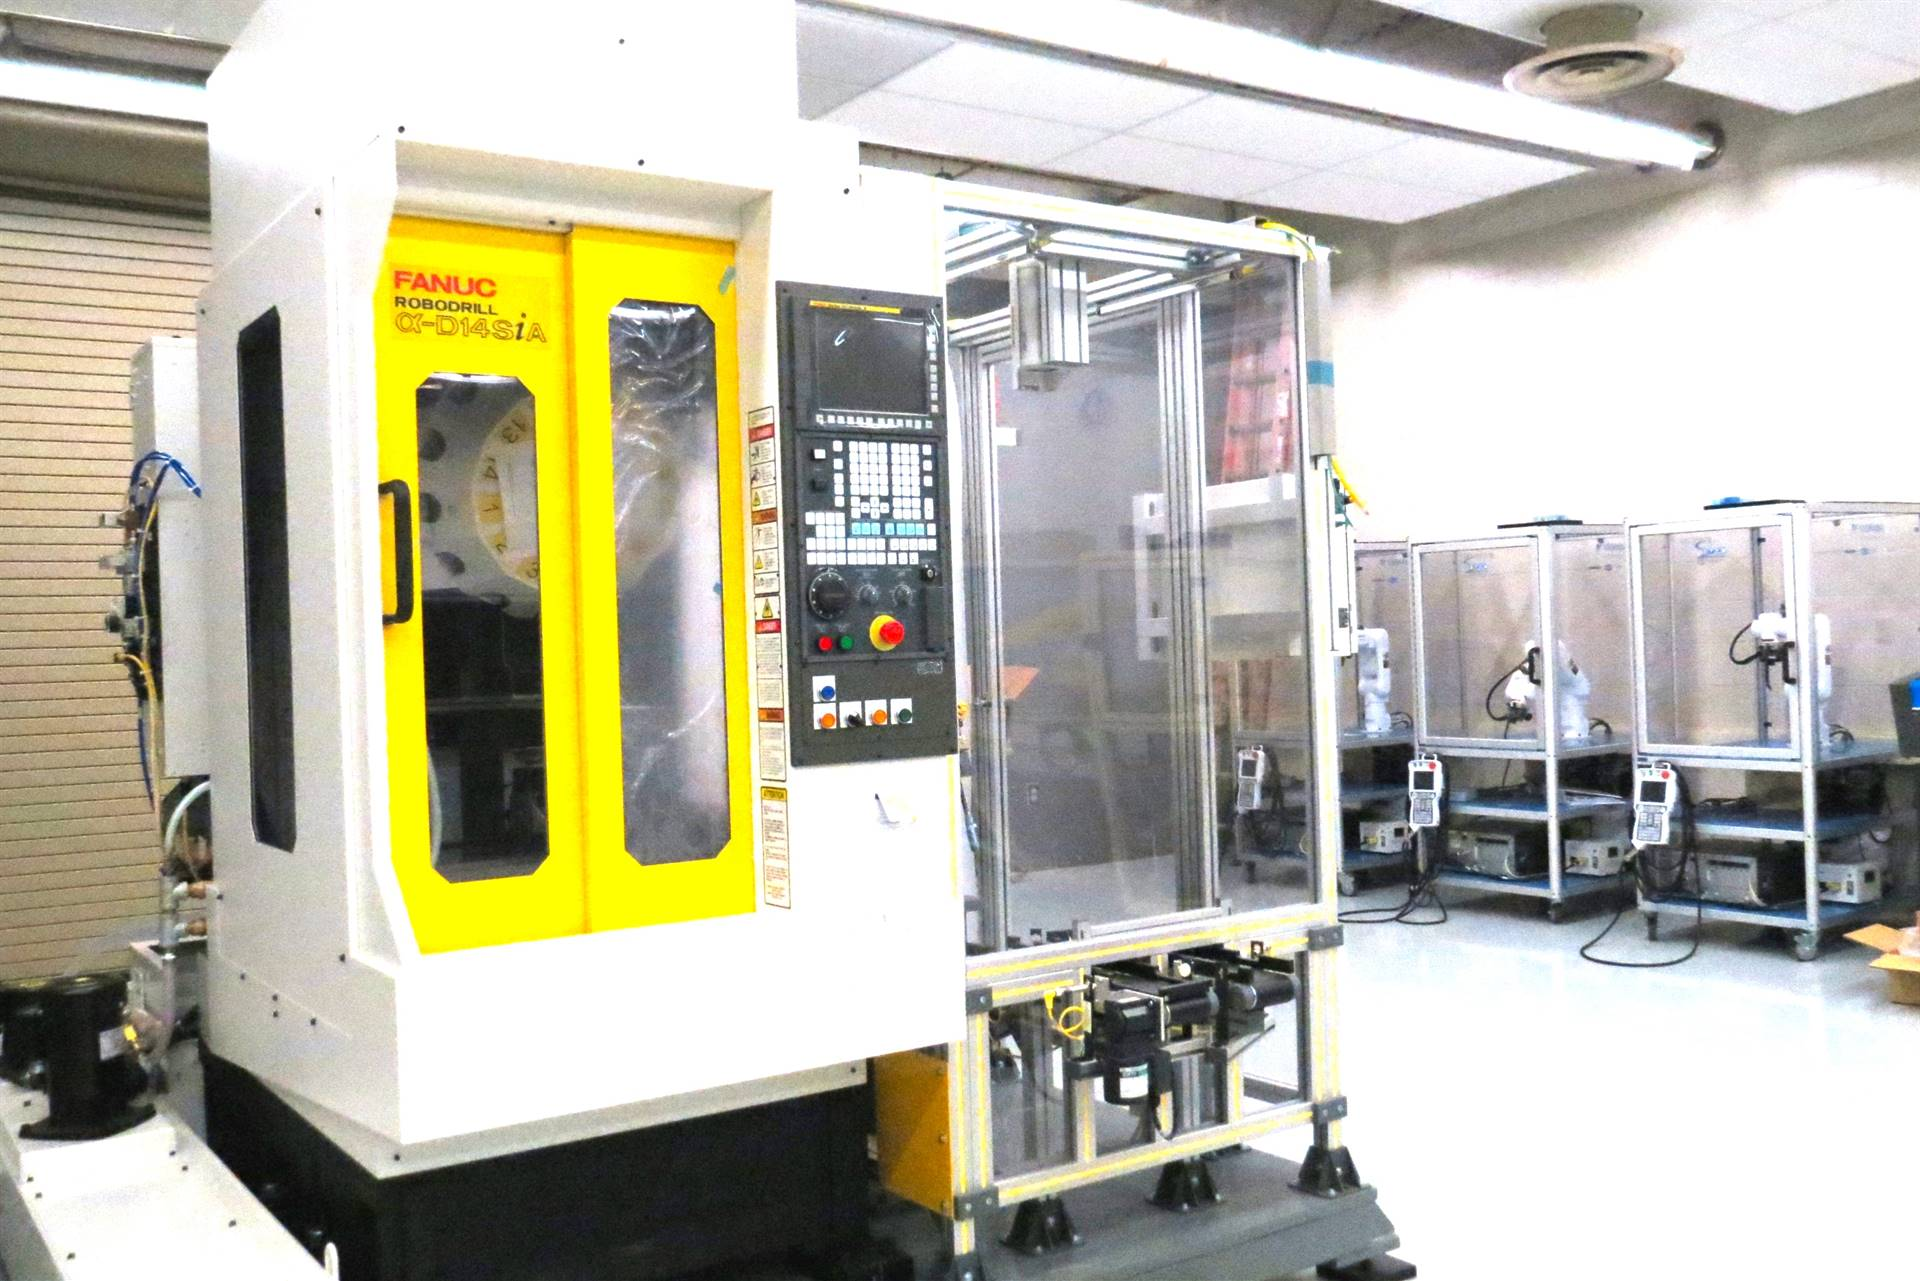 Equipment in the RAMTEC Center